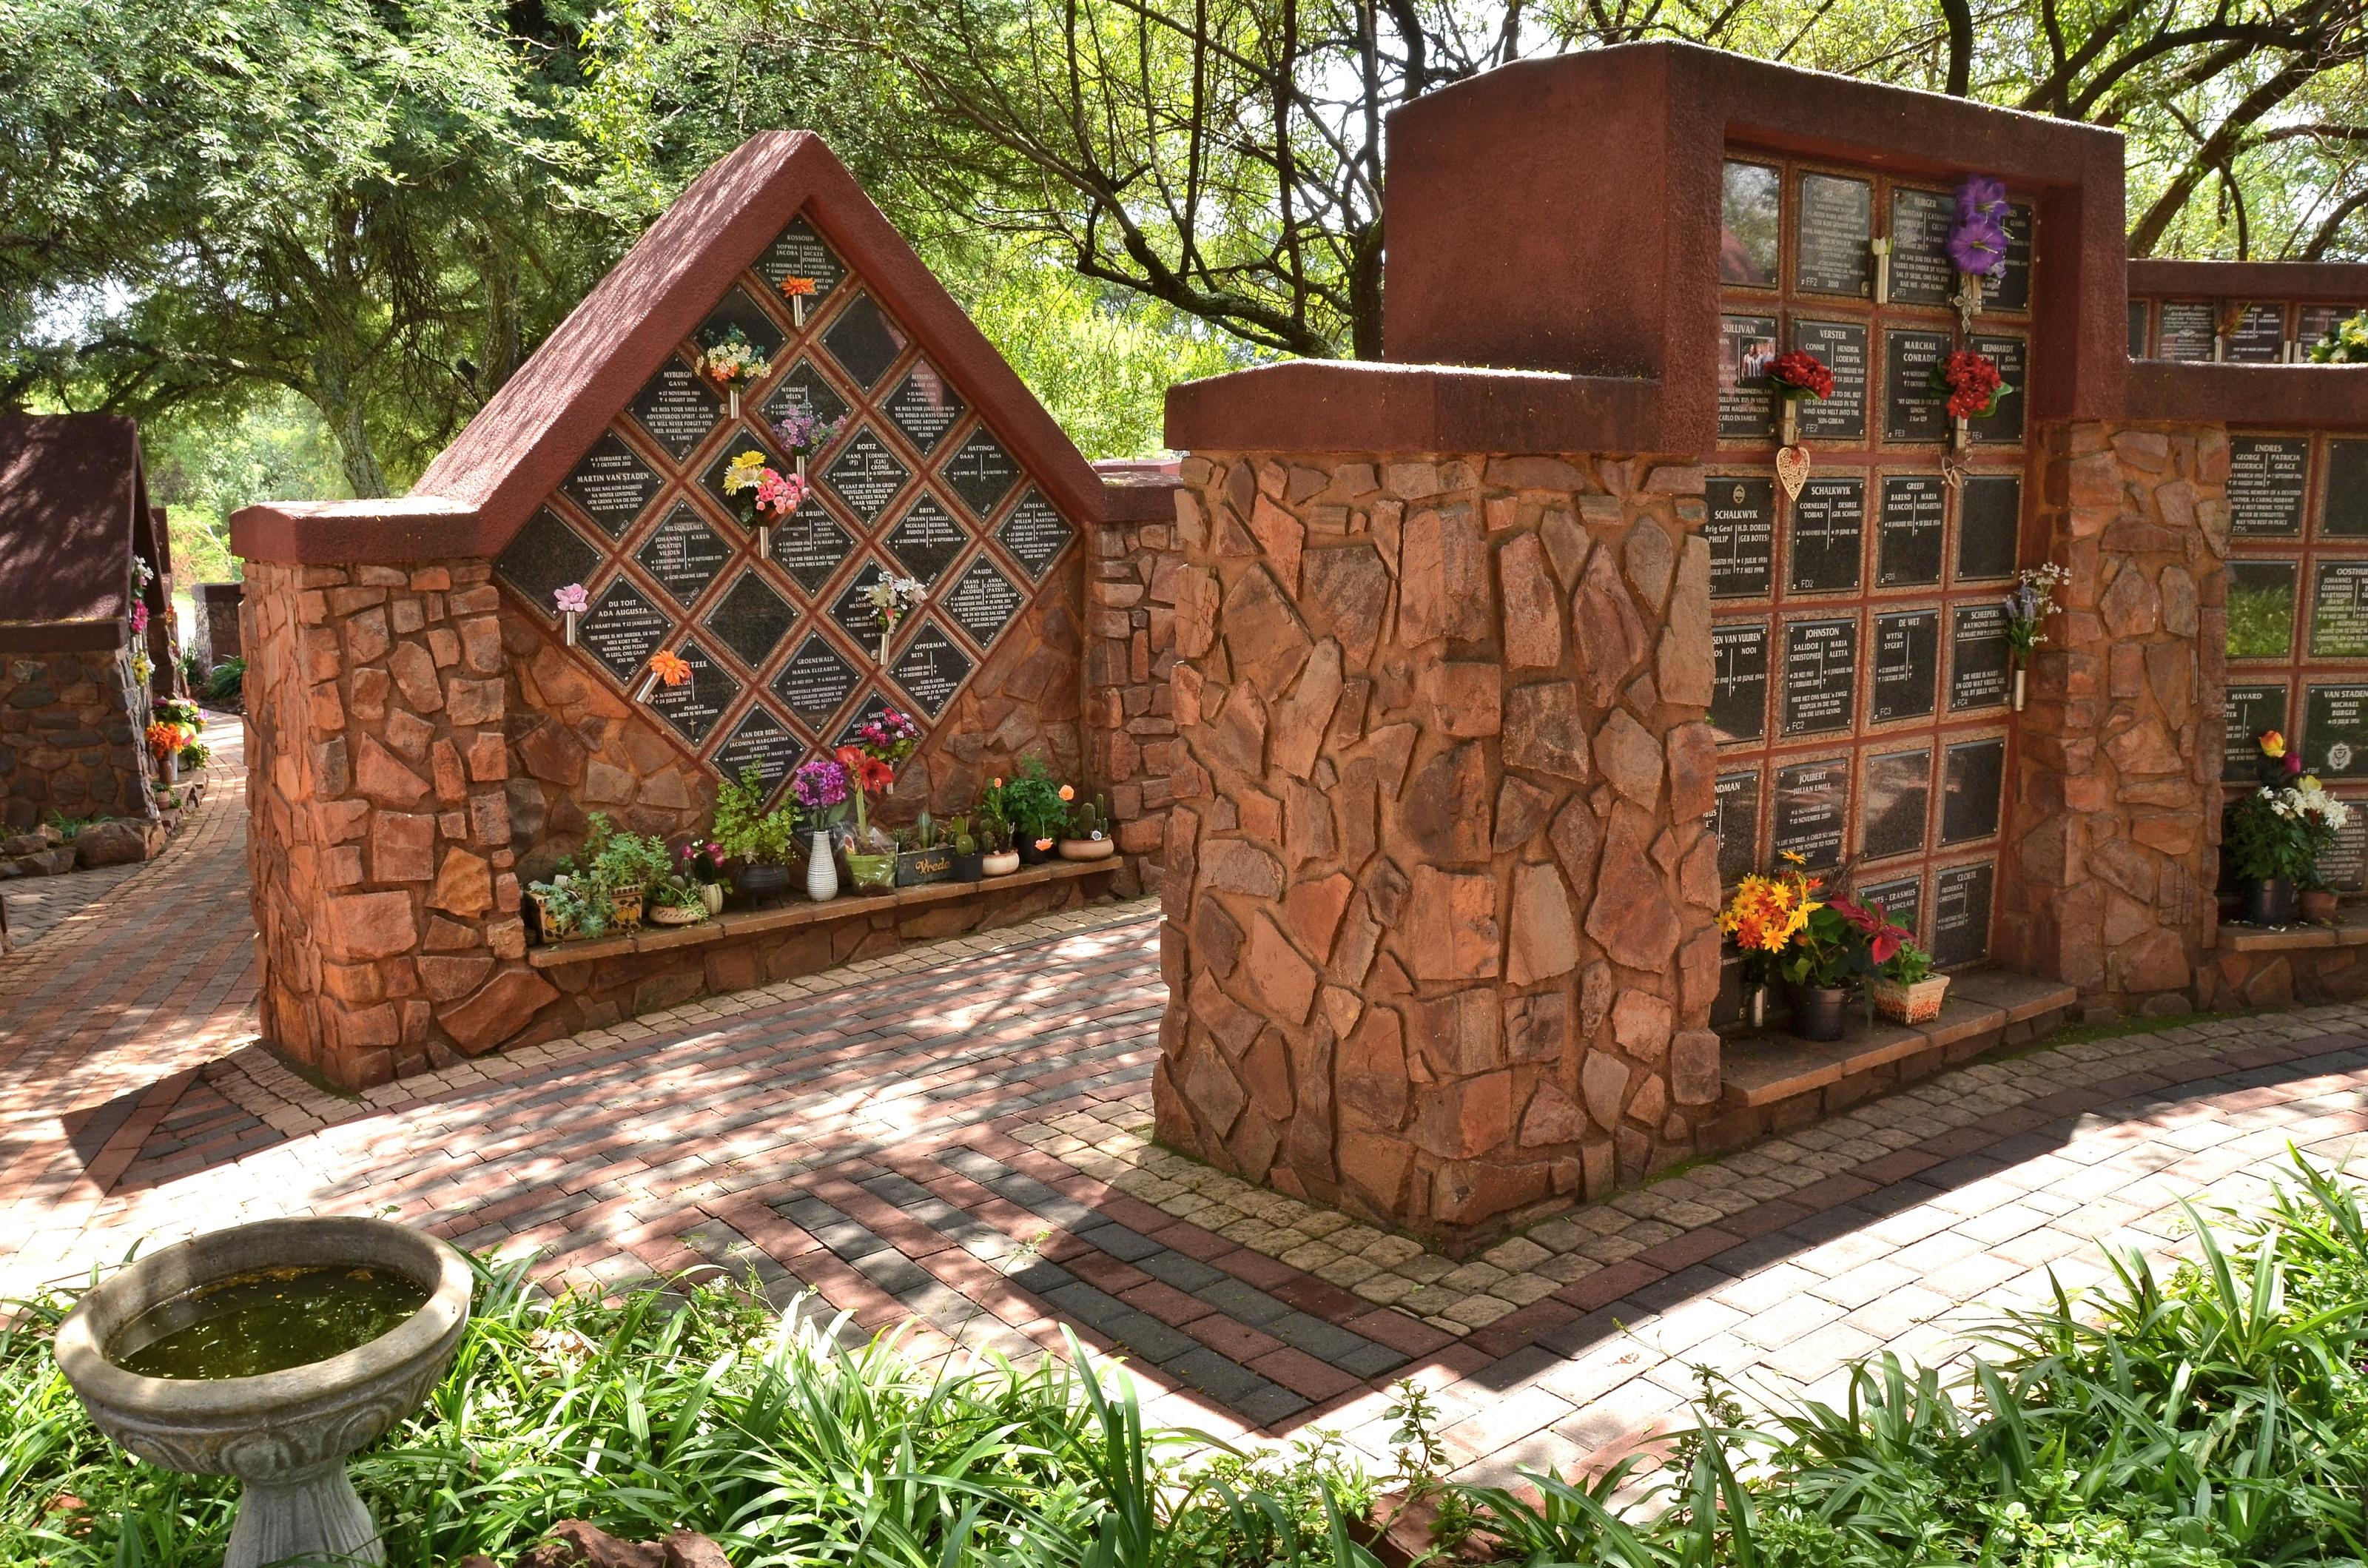 File:Garden of Remembrance VTM 03.jpg - Wikimedia Commons